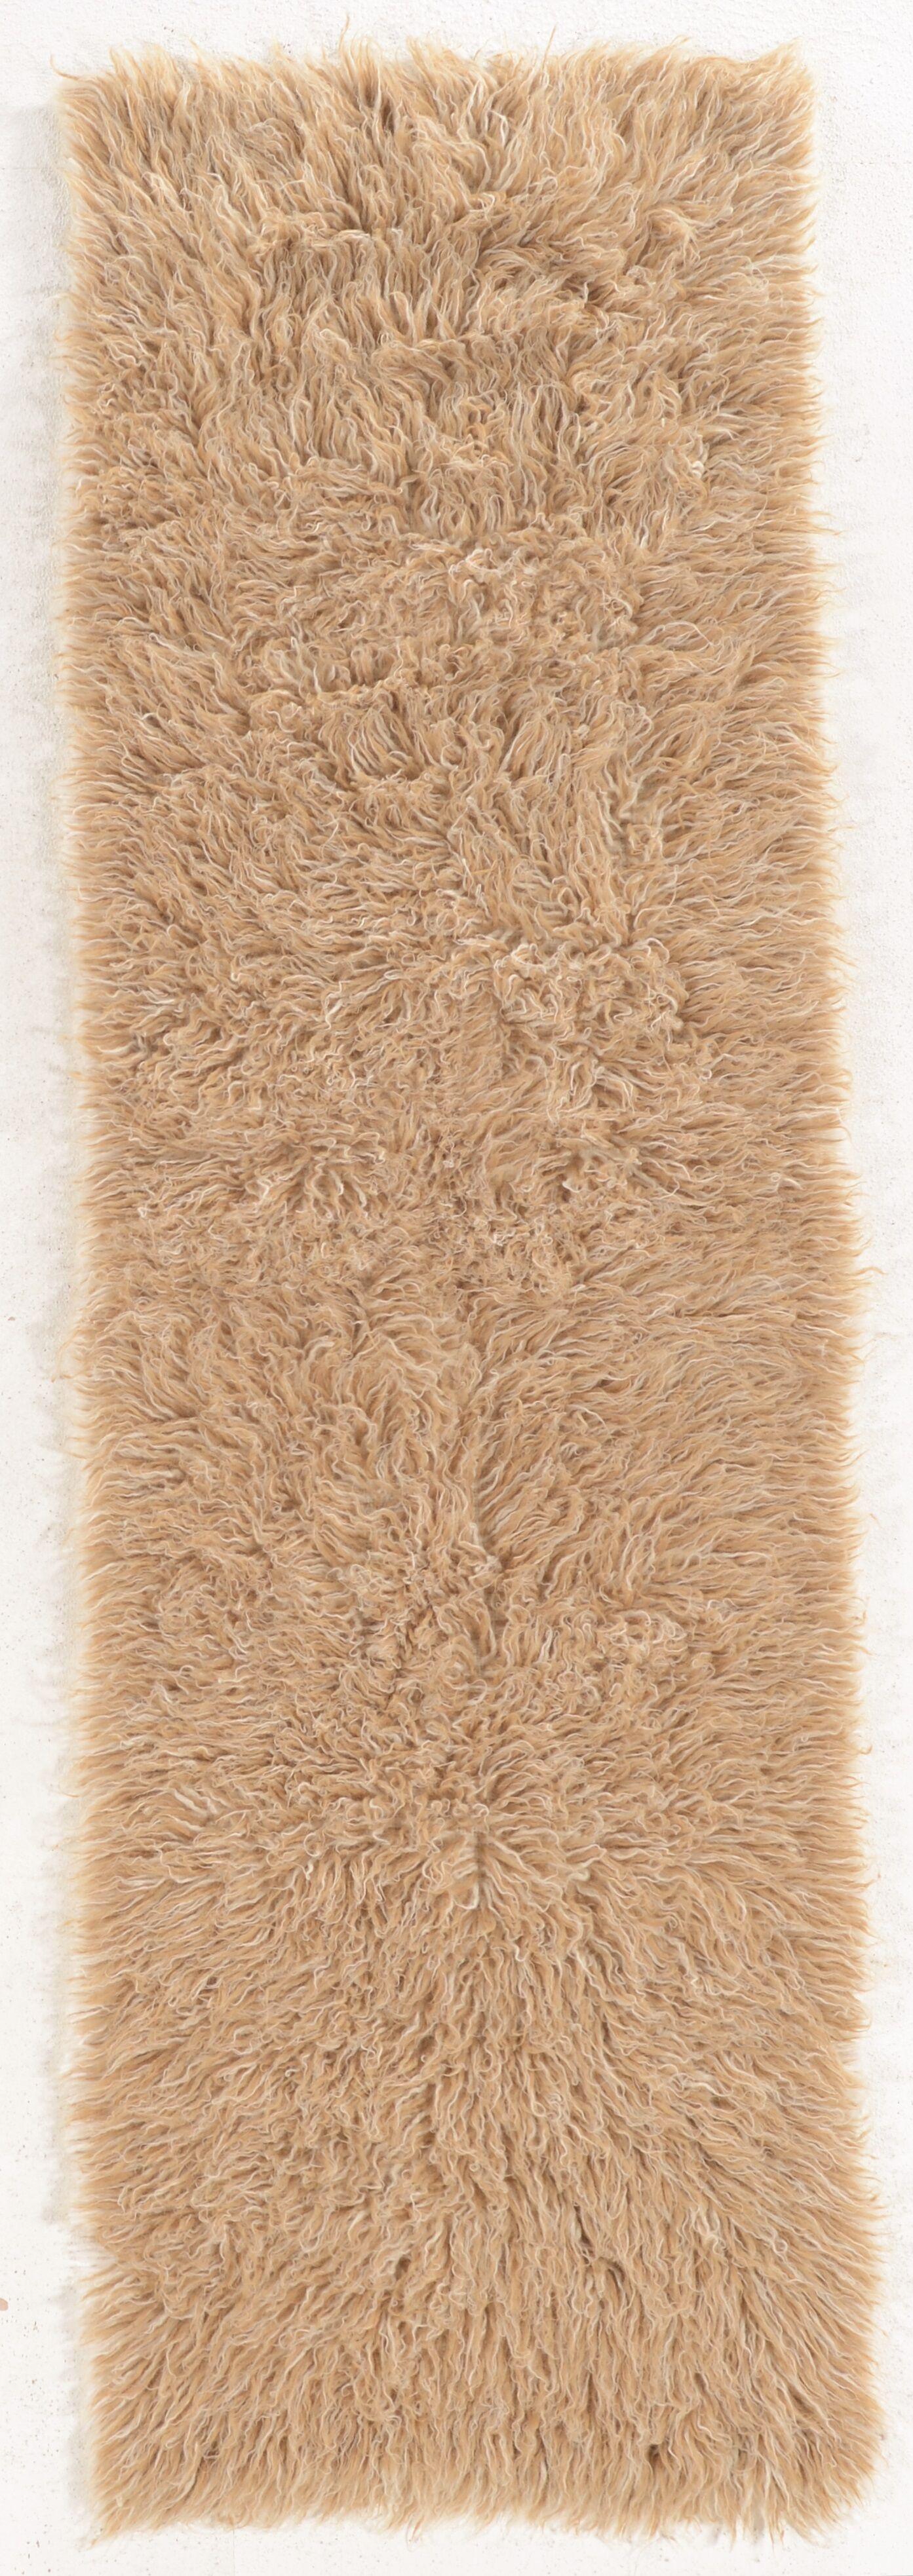 Bloomville Wool Tan/White Area Rug Rug Size: Runner 2'4